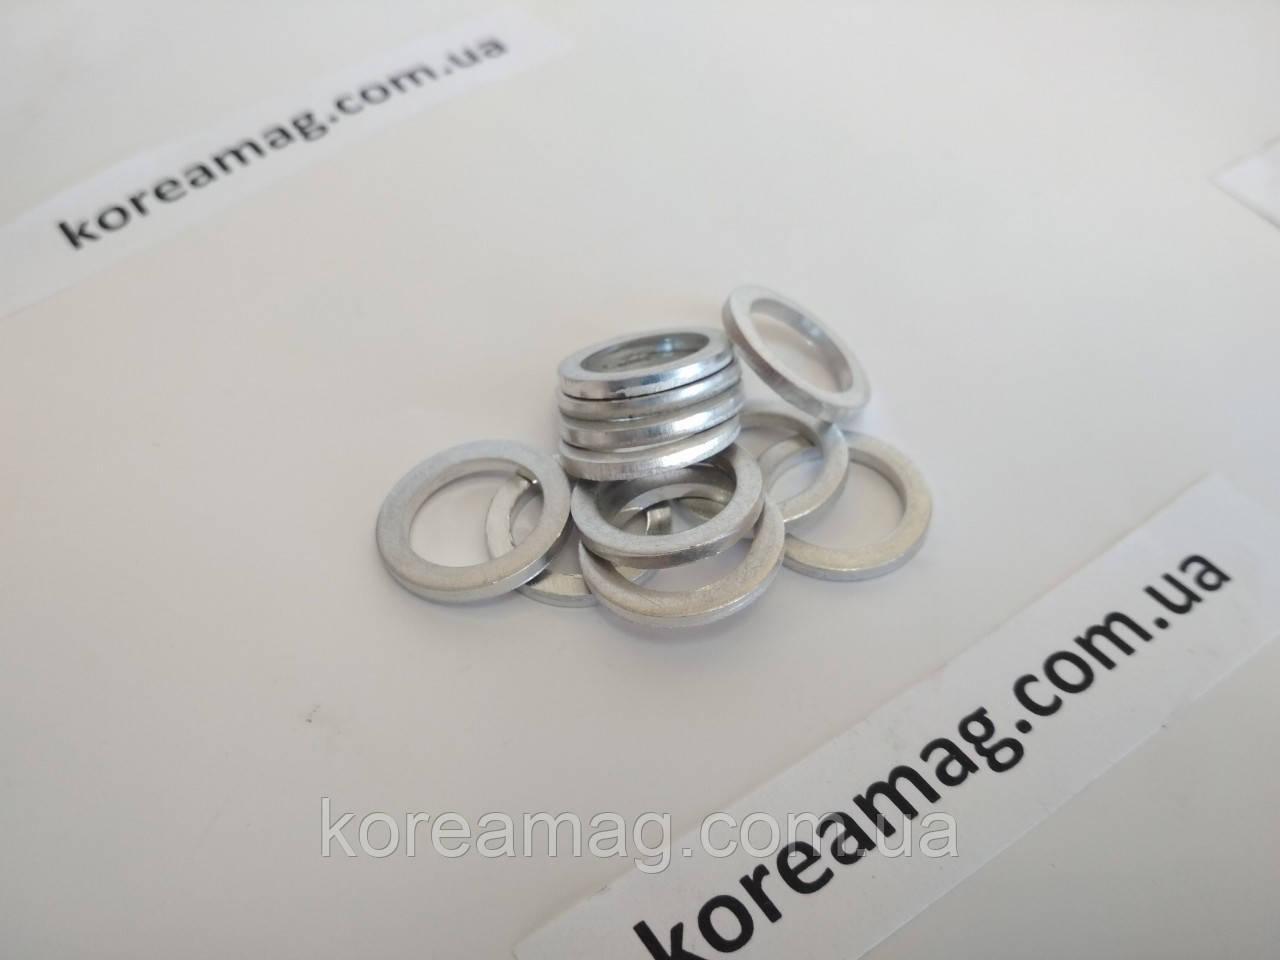 Прокладка пробки картера для всех легковых автомобилей Hyundai Kia